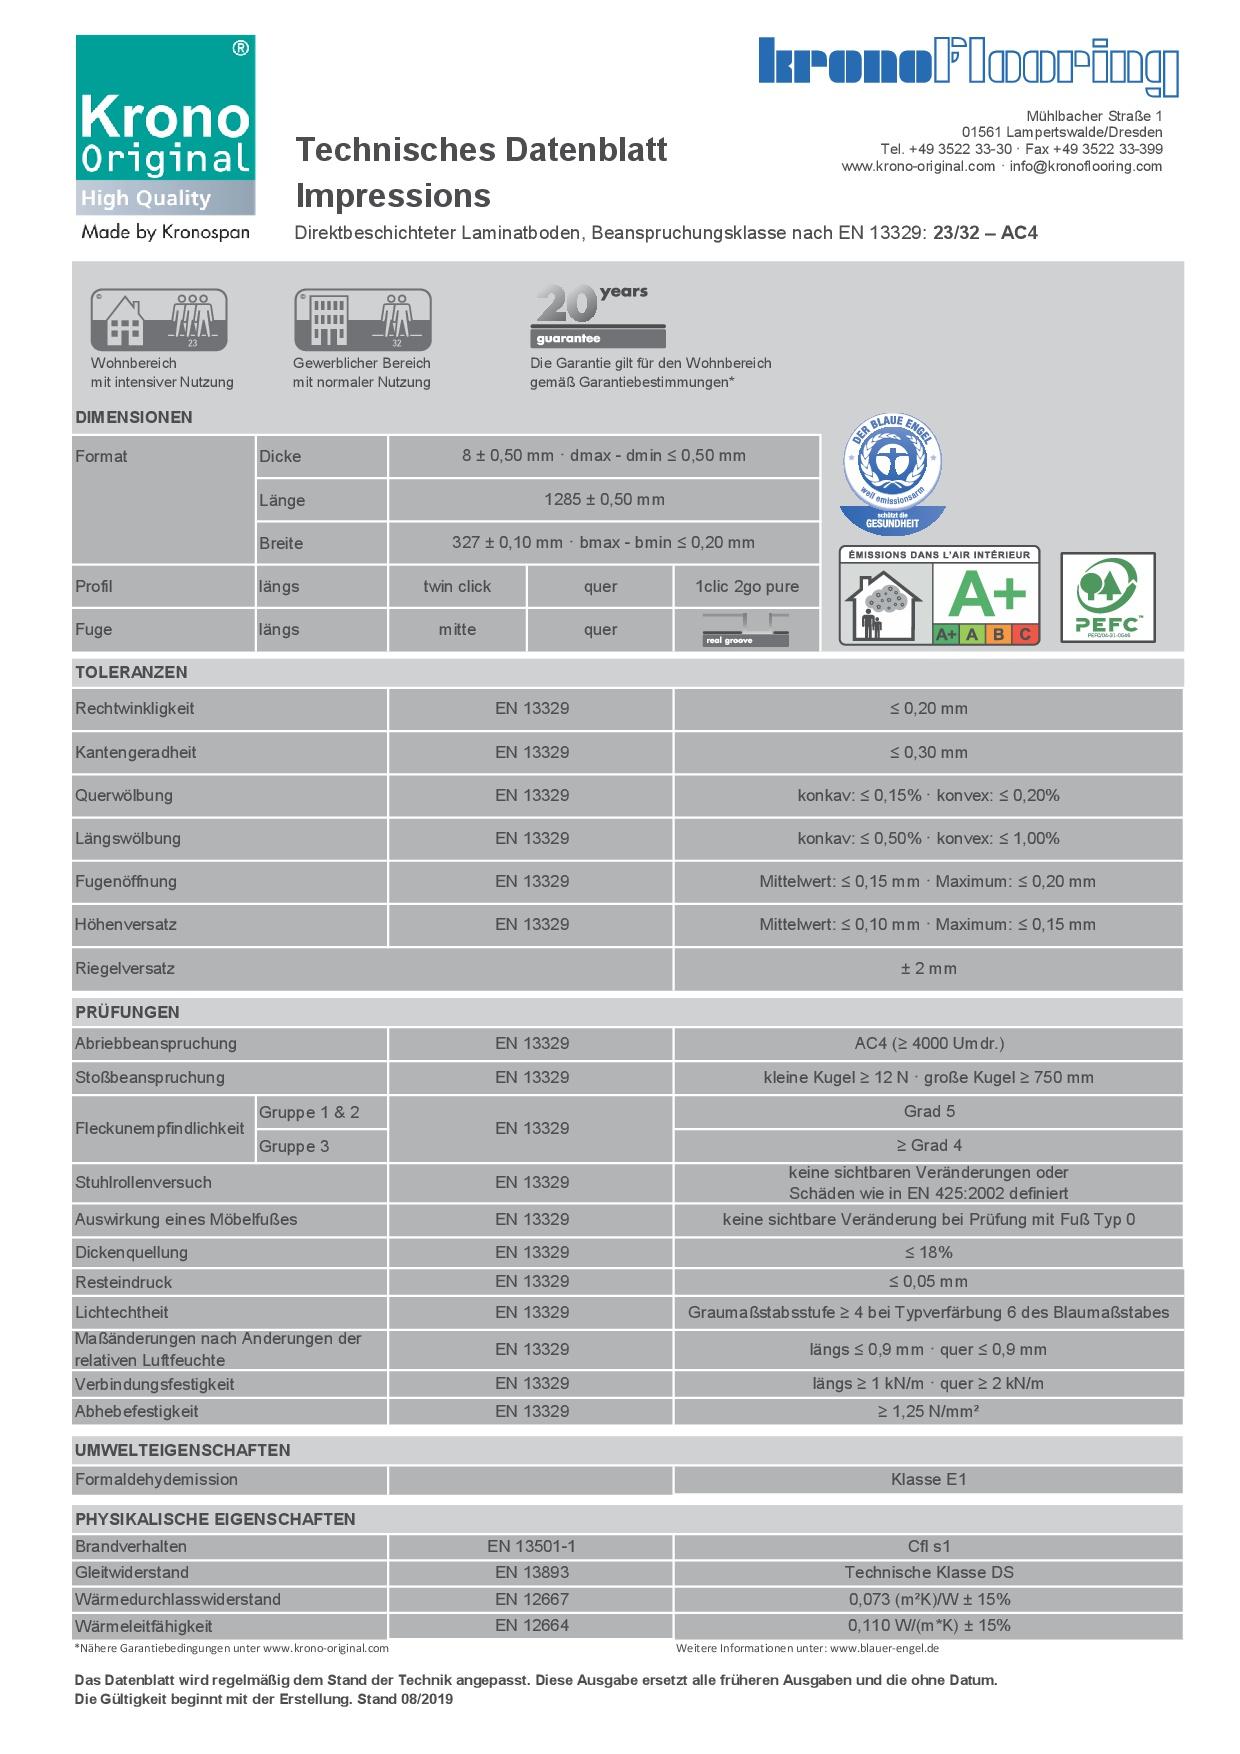 Technisches_Datenblatt_Impressions_dt_Pure